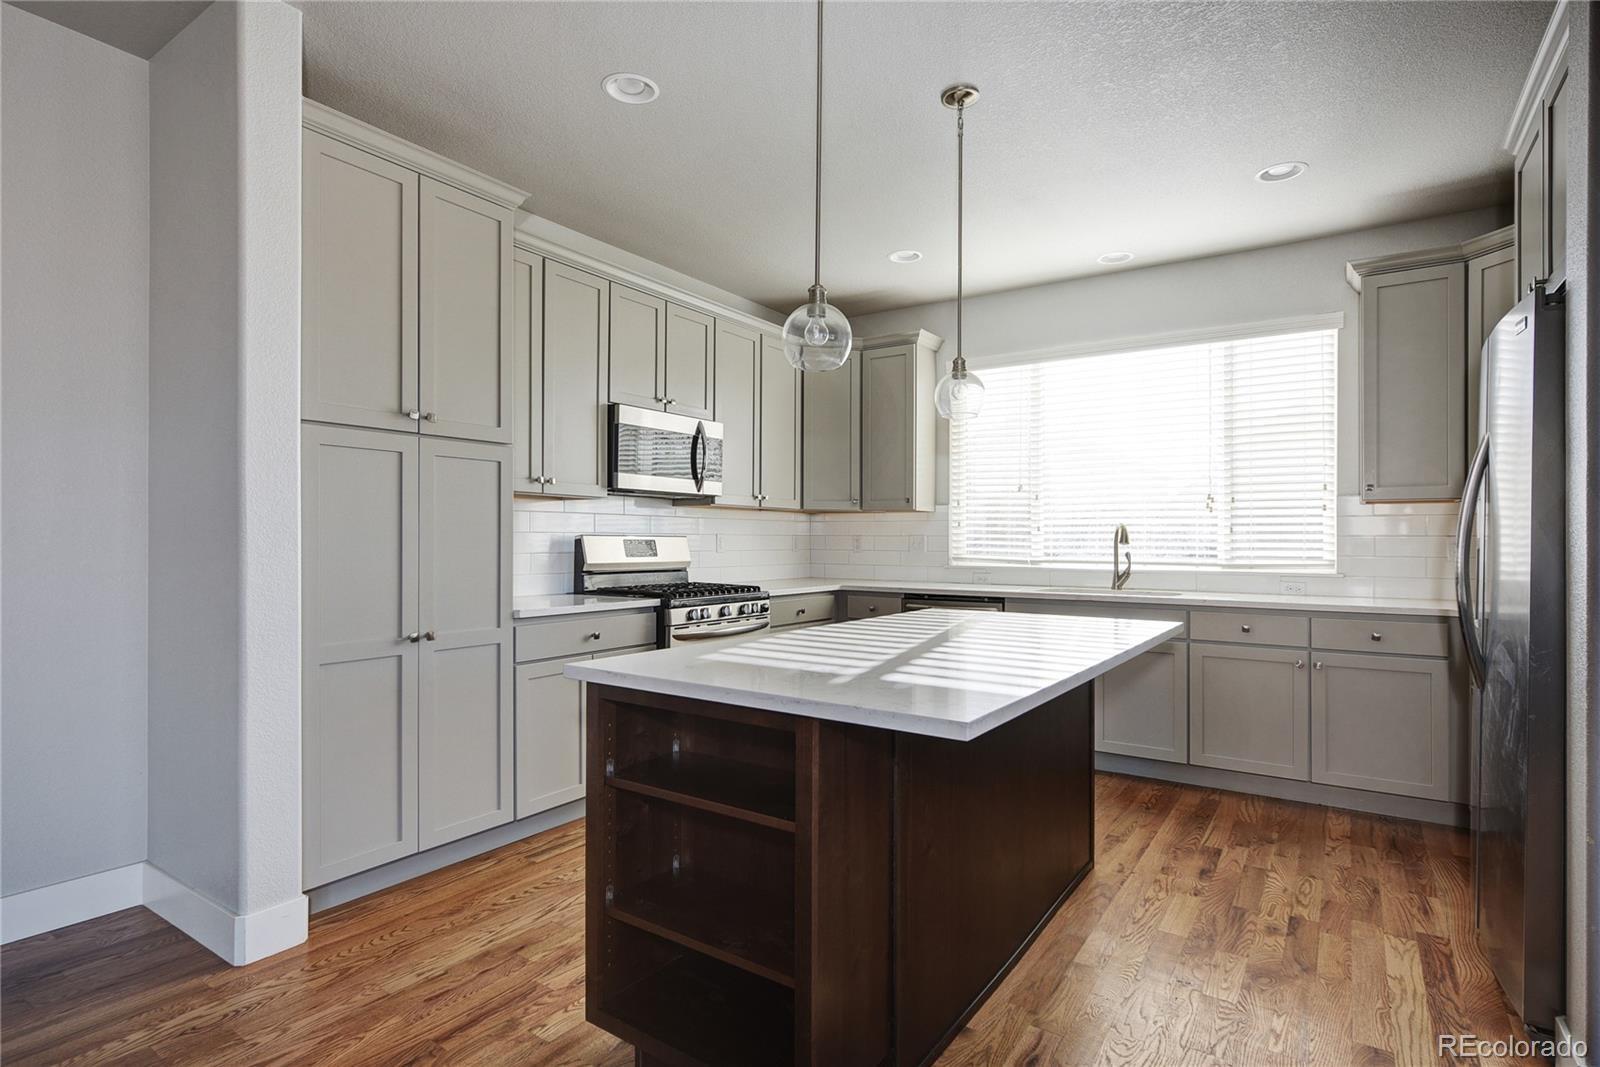 MLS# 3928660 - 7 - 1444 Moonlight Drive, Longmont, CO 80504